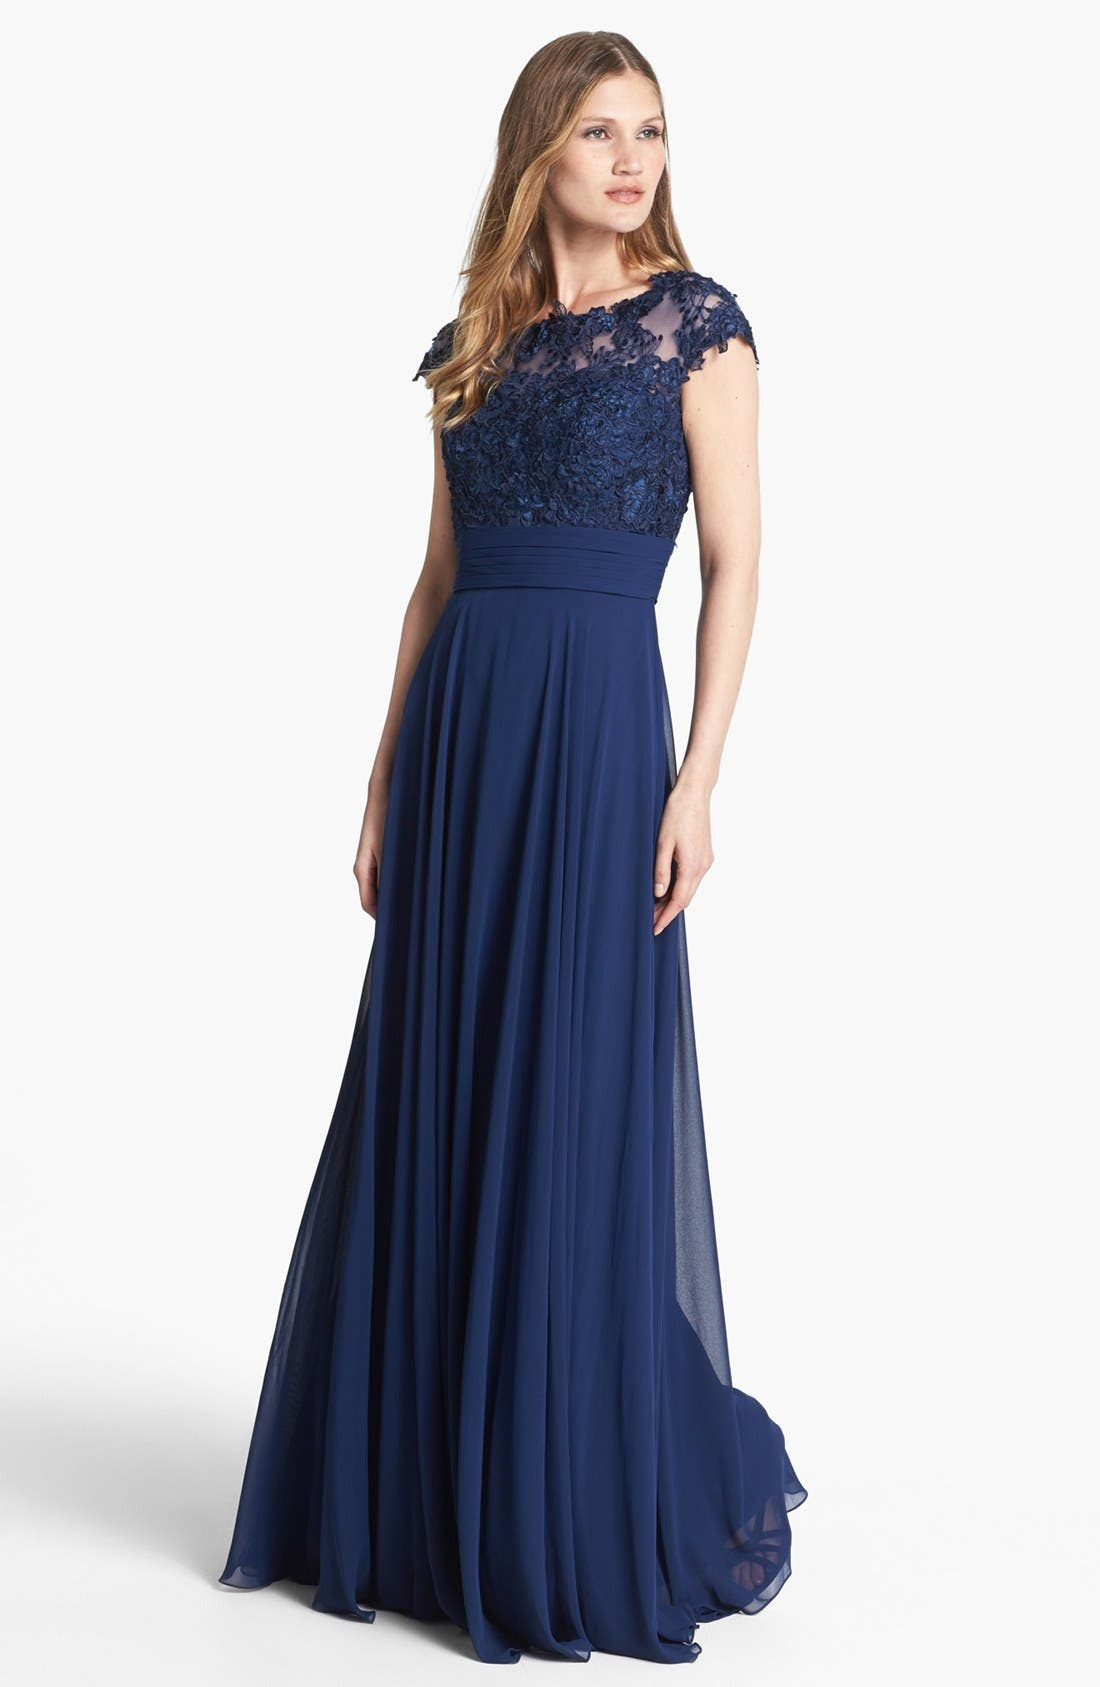 Main Image - La Femme Lace Bodice Ball Gown